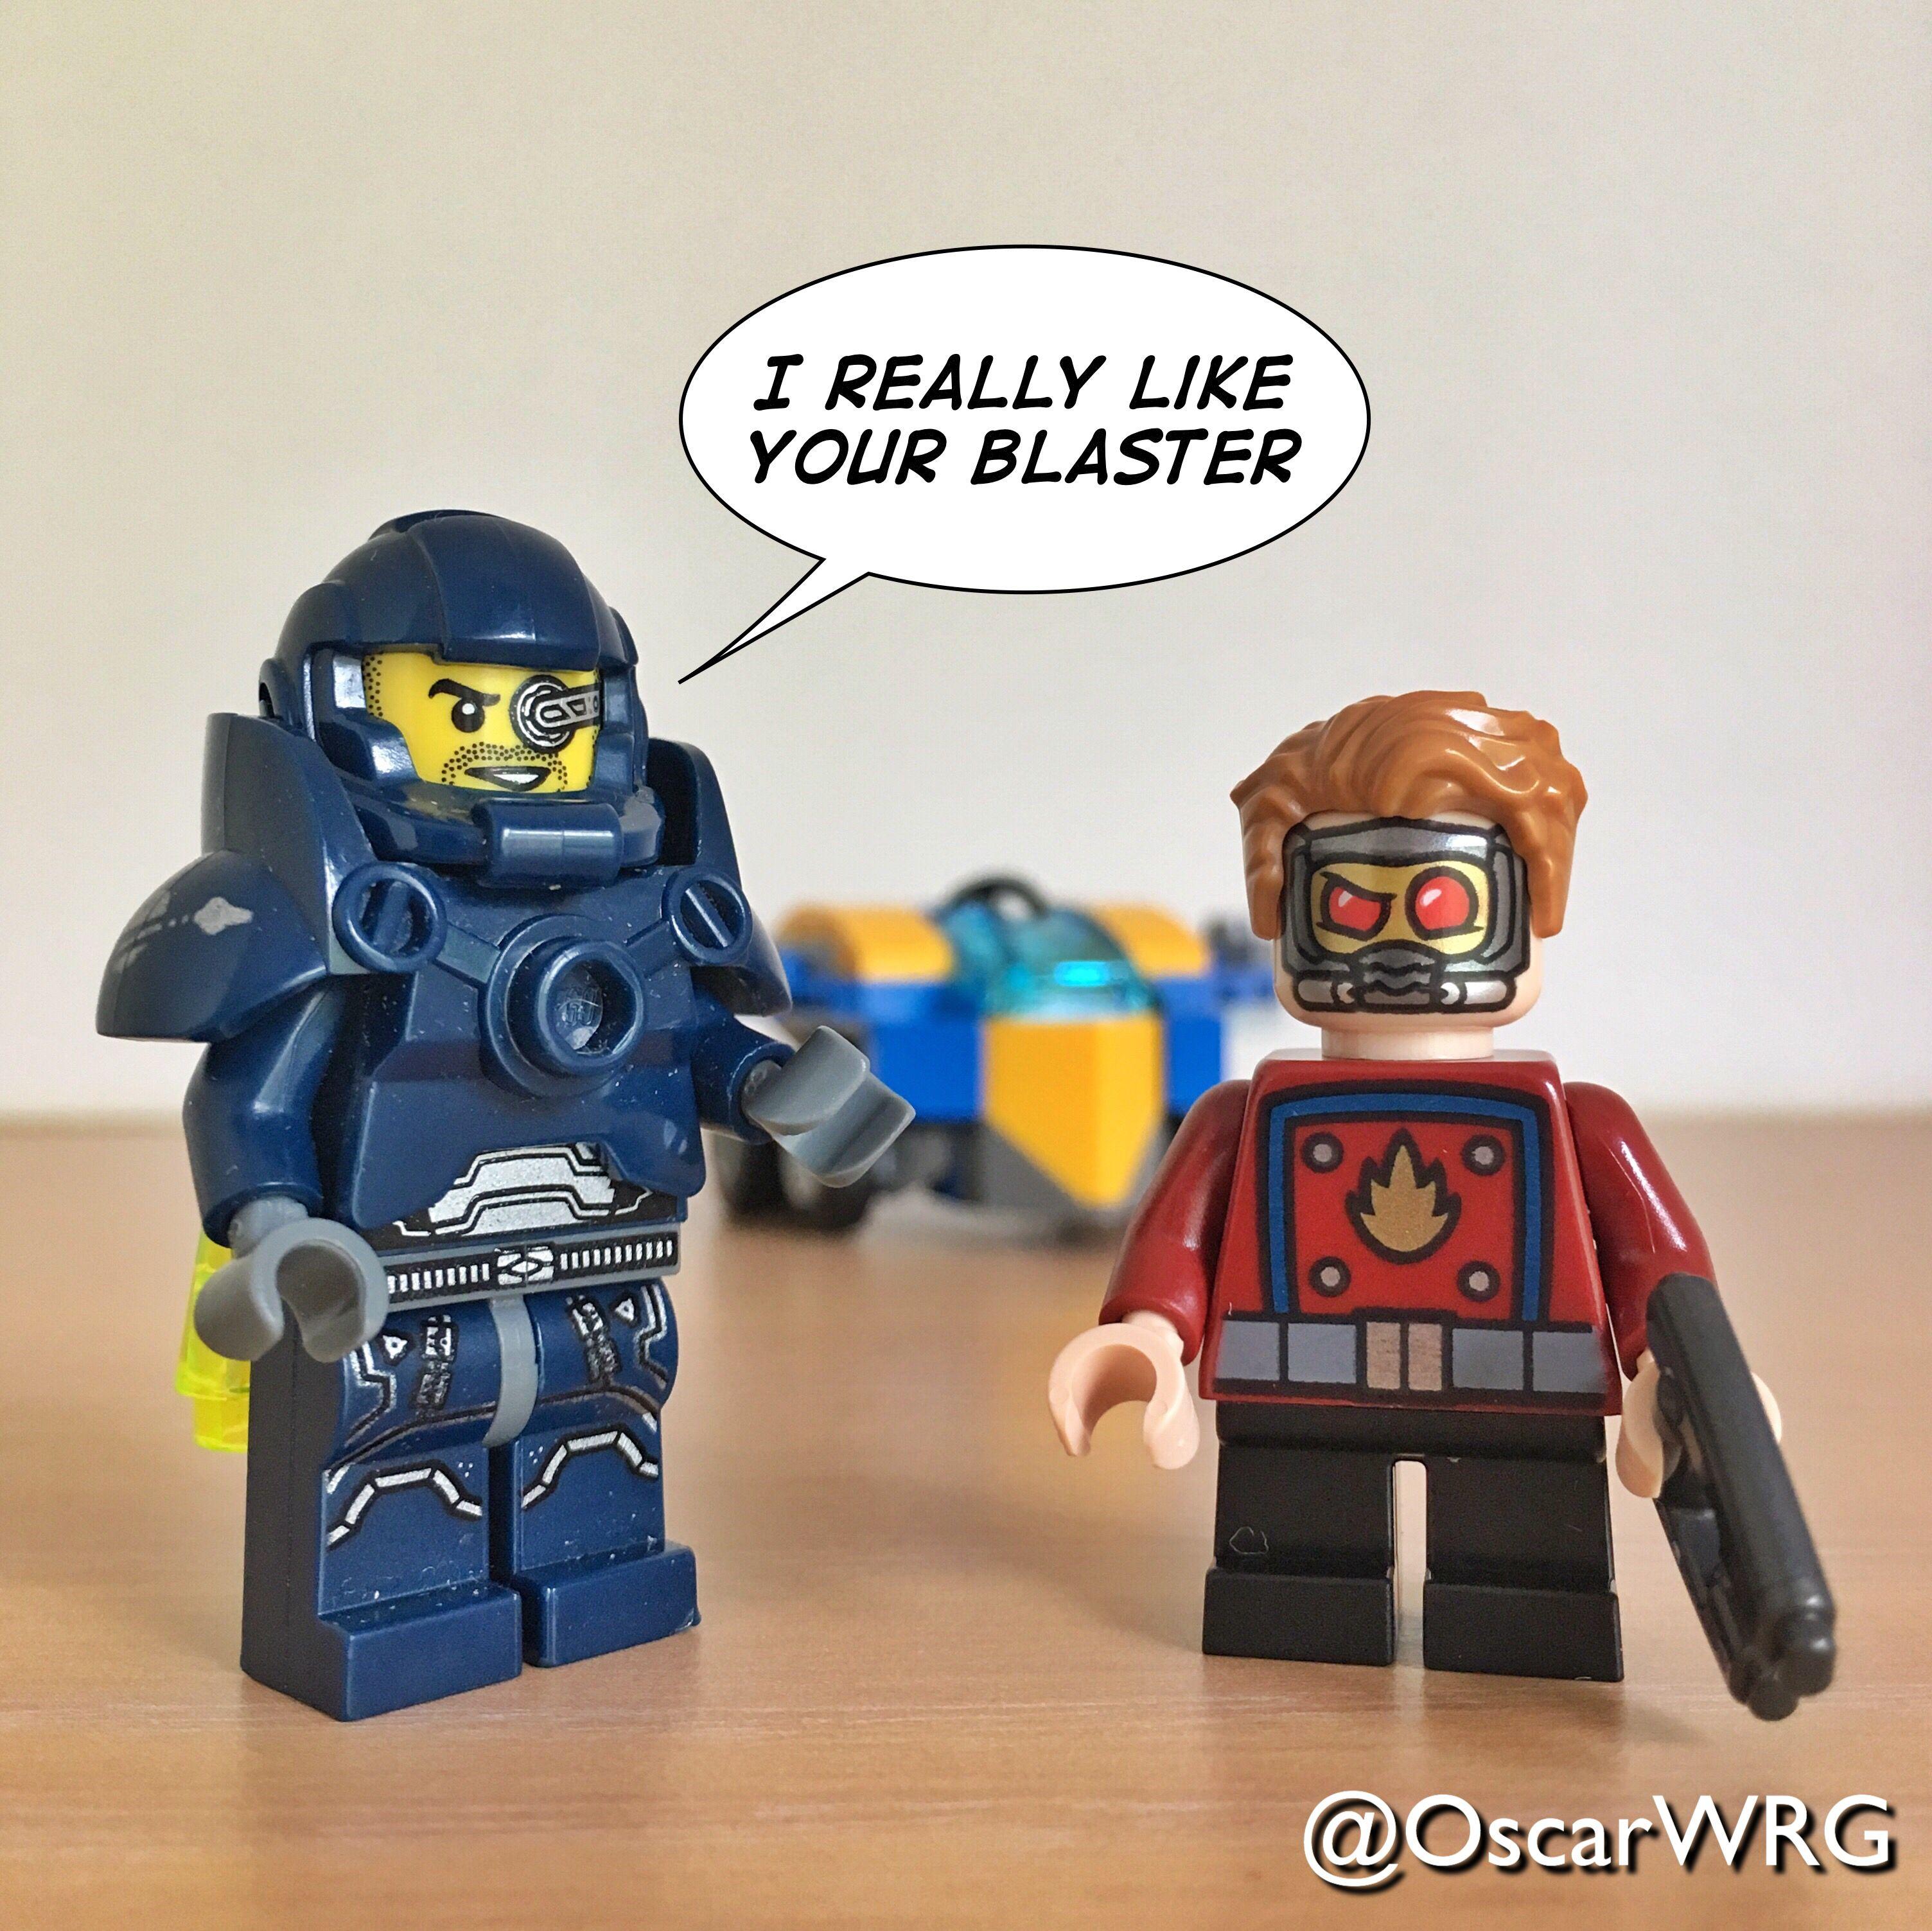 #Lego Galaxy Patrol #Lego #Legomightymicros #Starlords #Space #Blaster #Spaceblaster